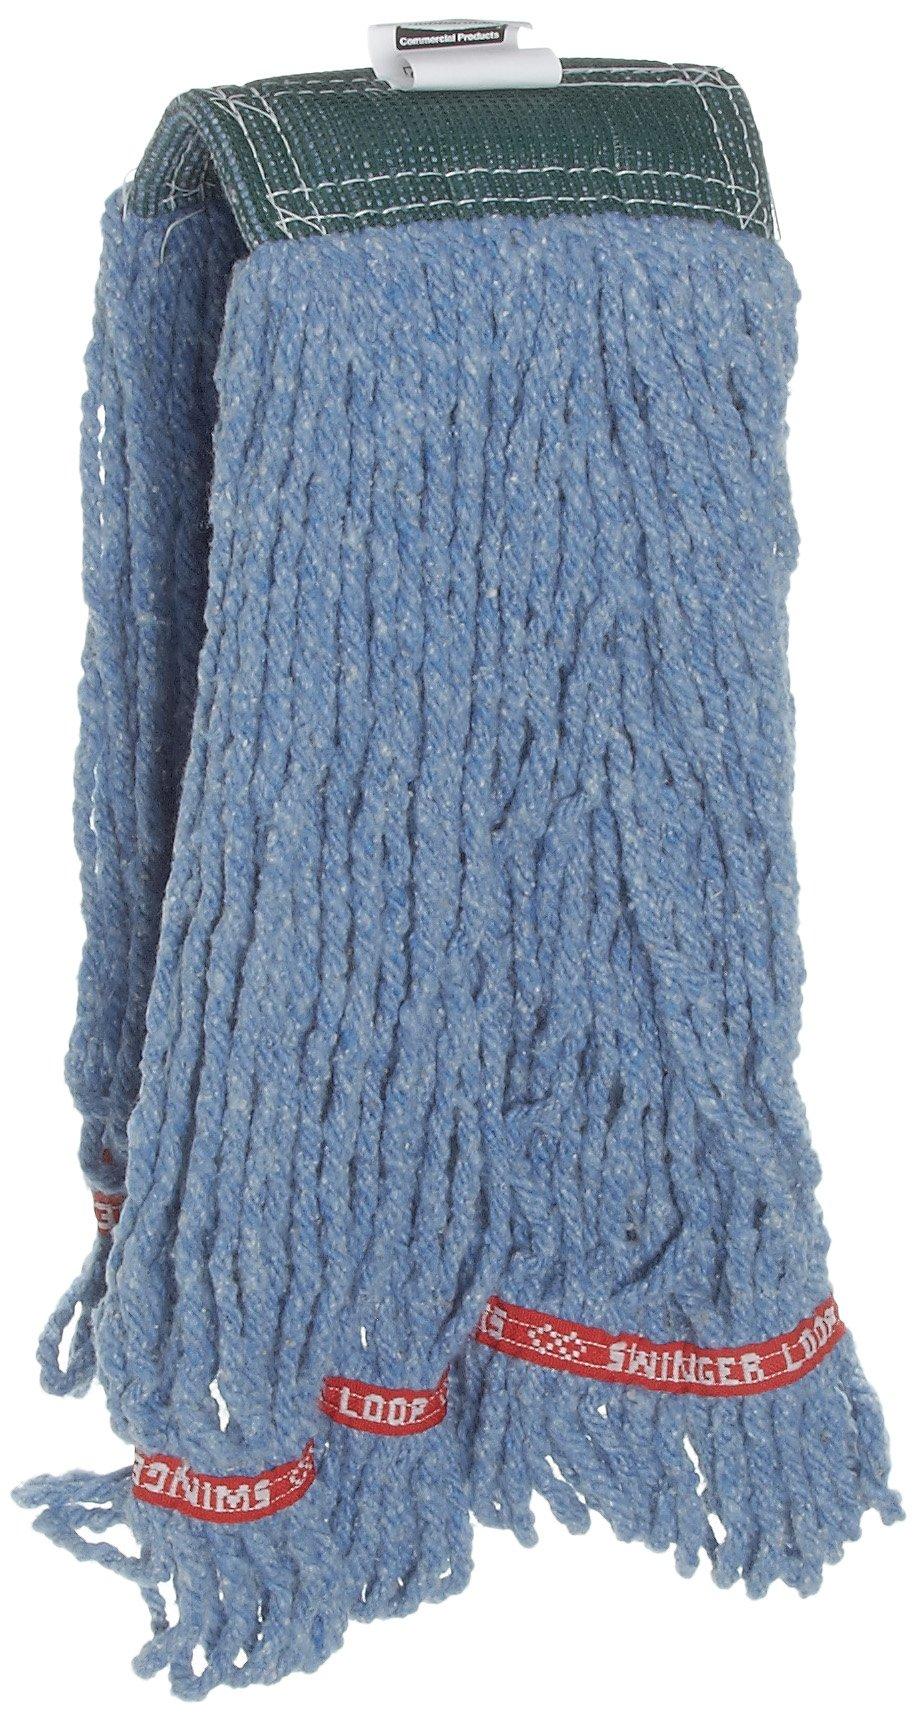 Rubbermaid Commercial Swinger Loop Shrinkless Wet Mop, Medium, Blue, FGC25206BL00